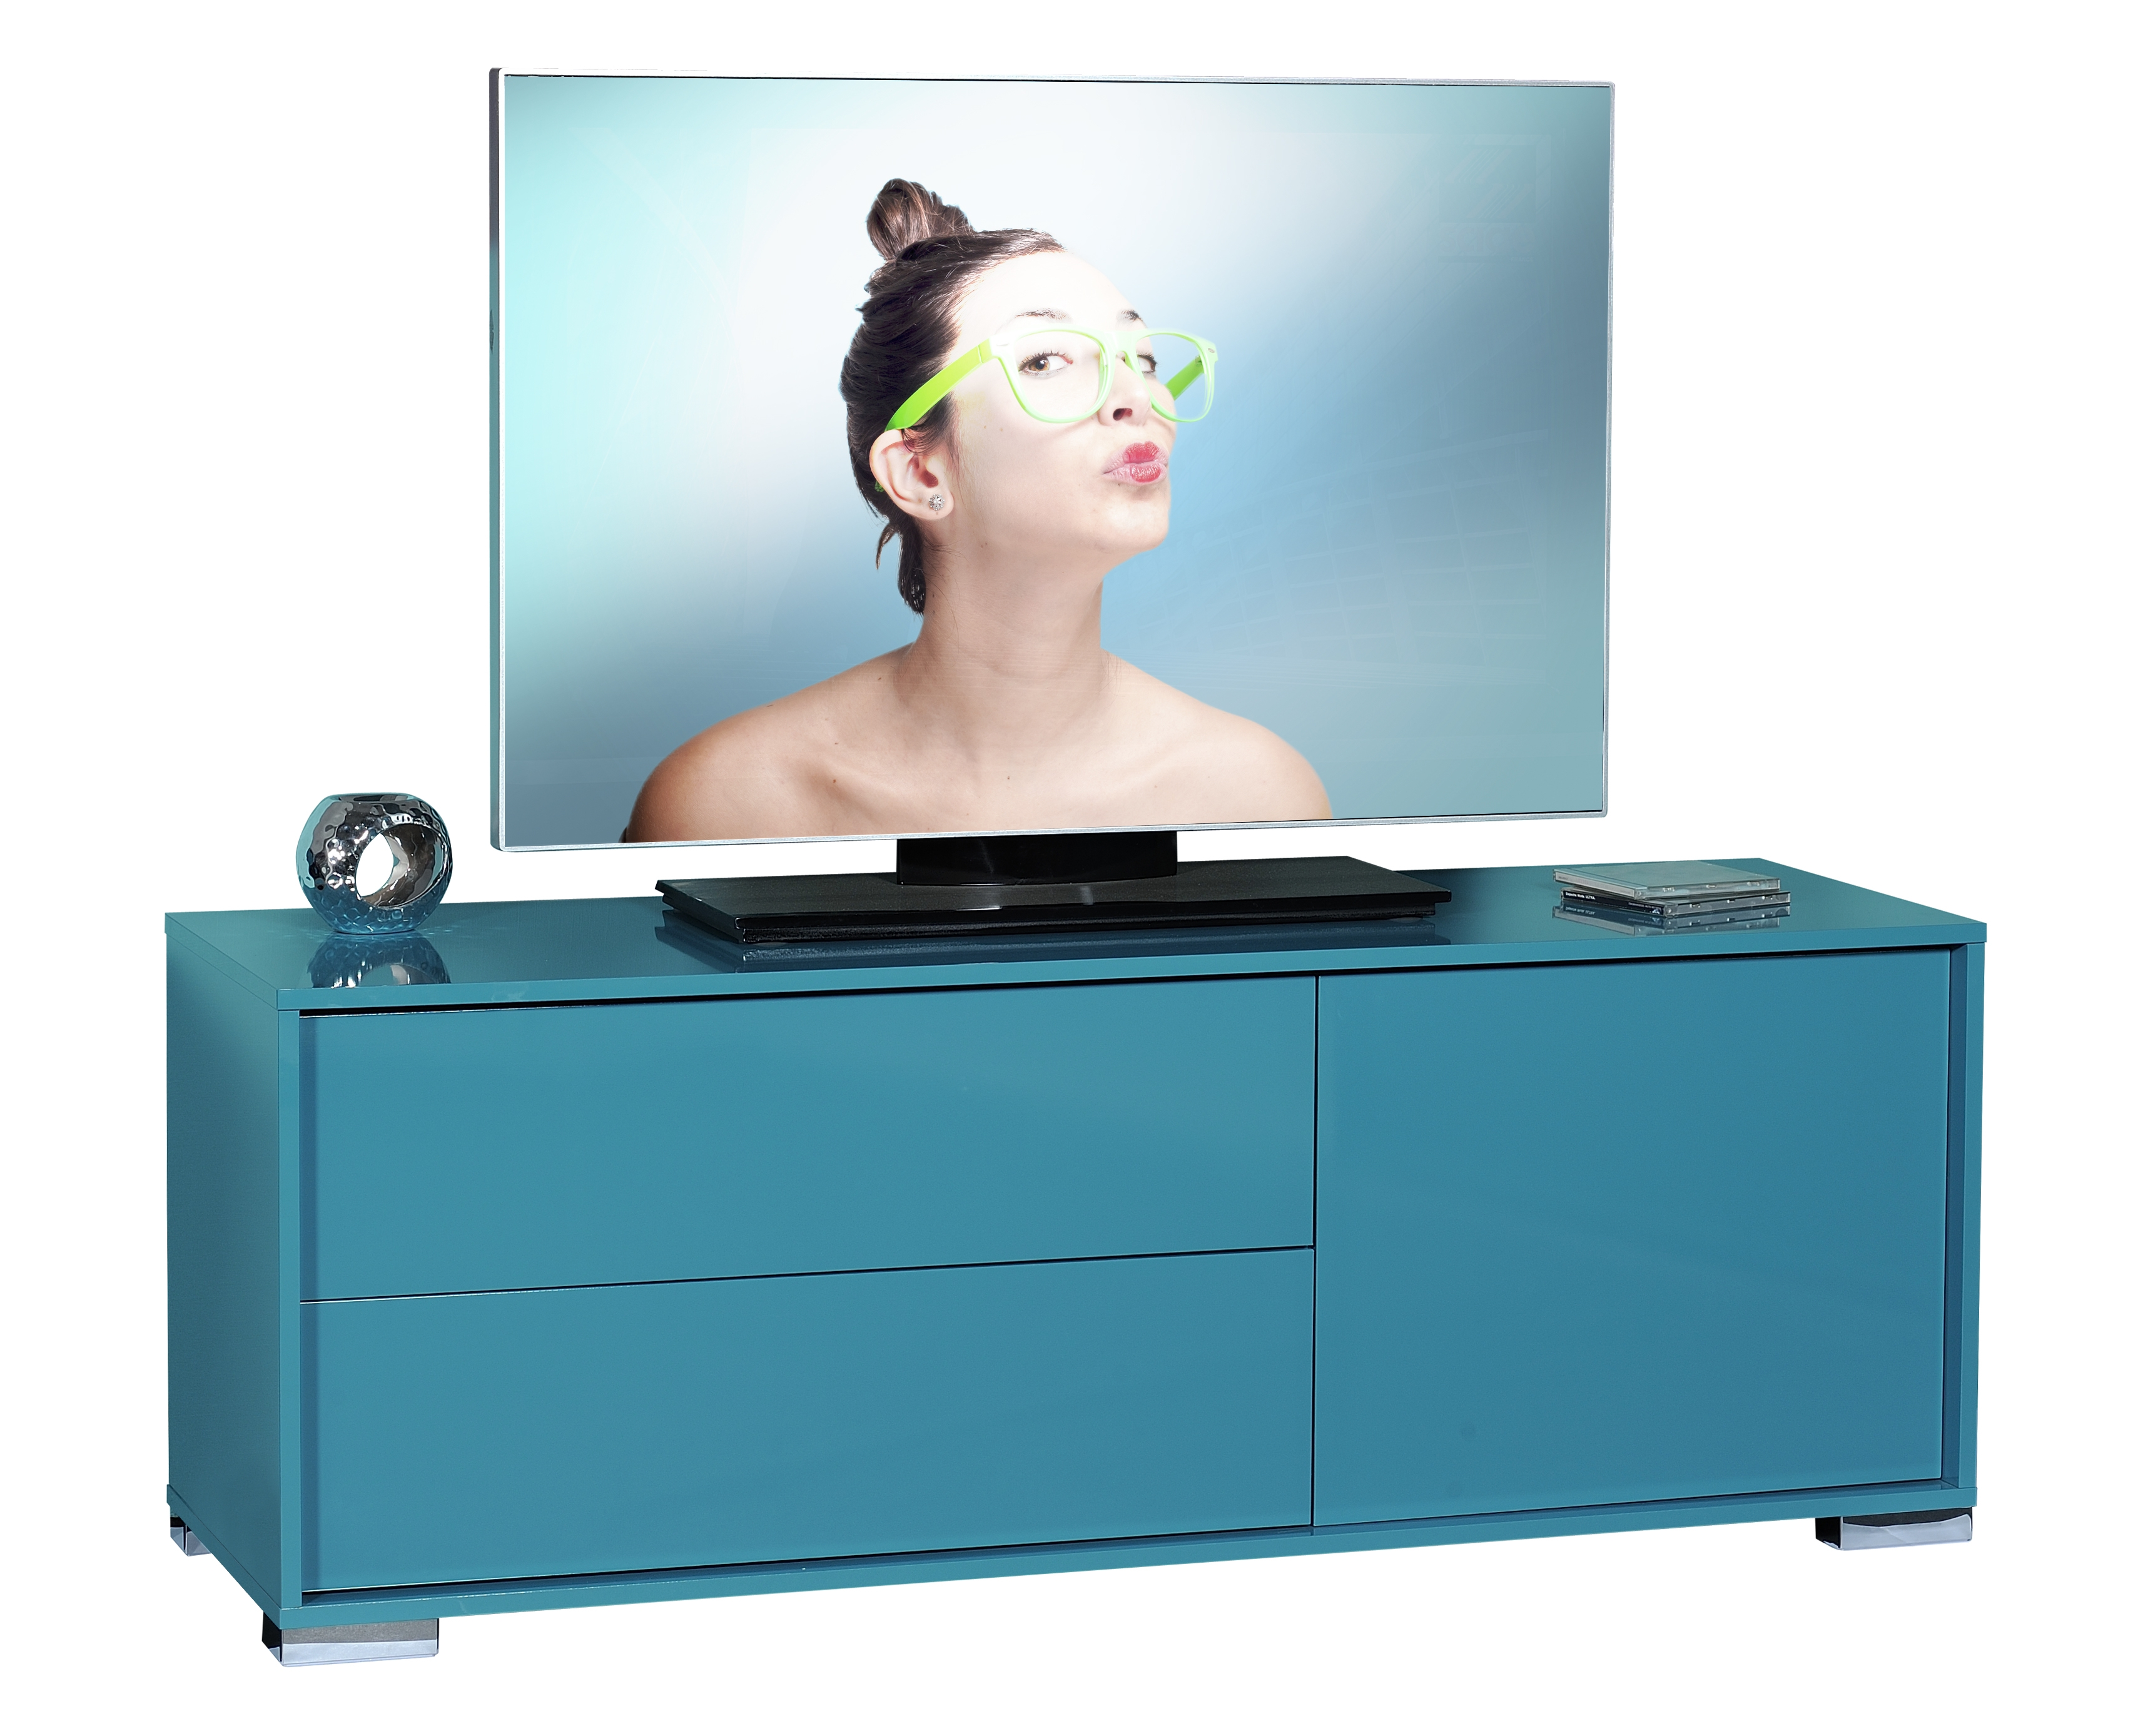 Meuble TV Bleu brillant Like  LesTendancesfr -> Meuble Tv Bleu